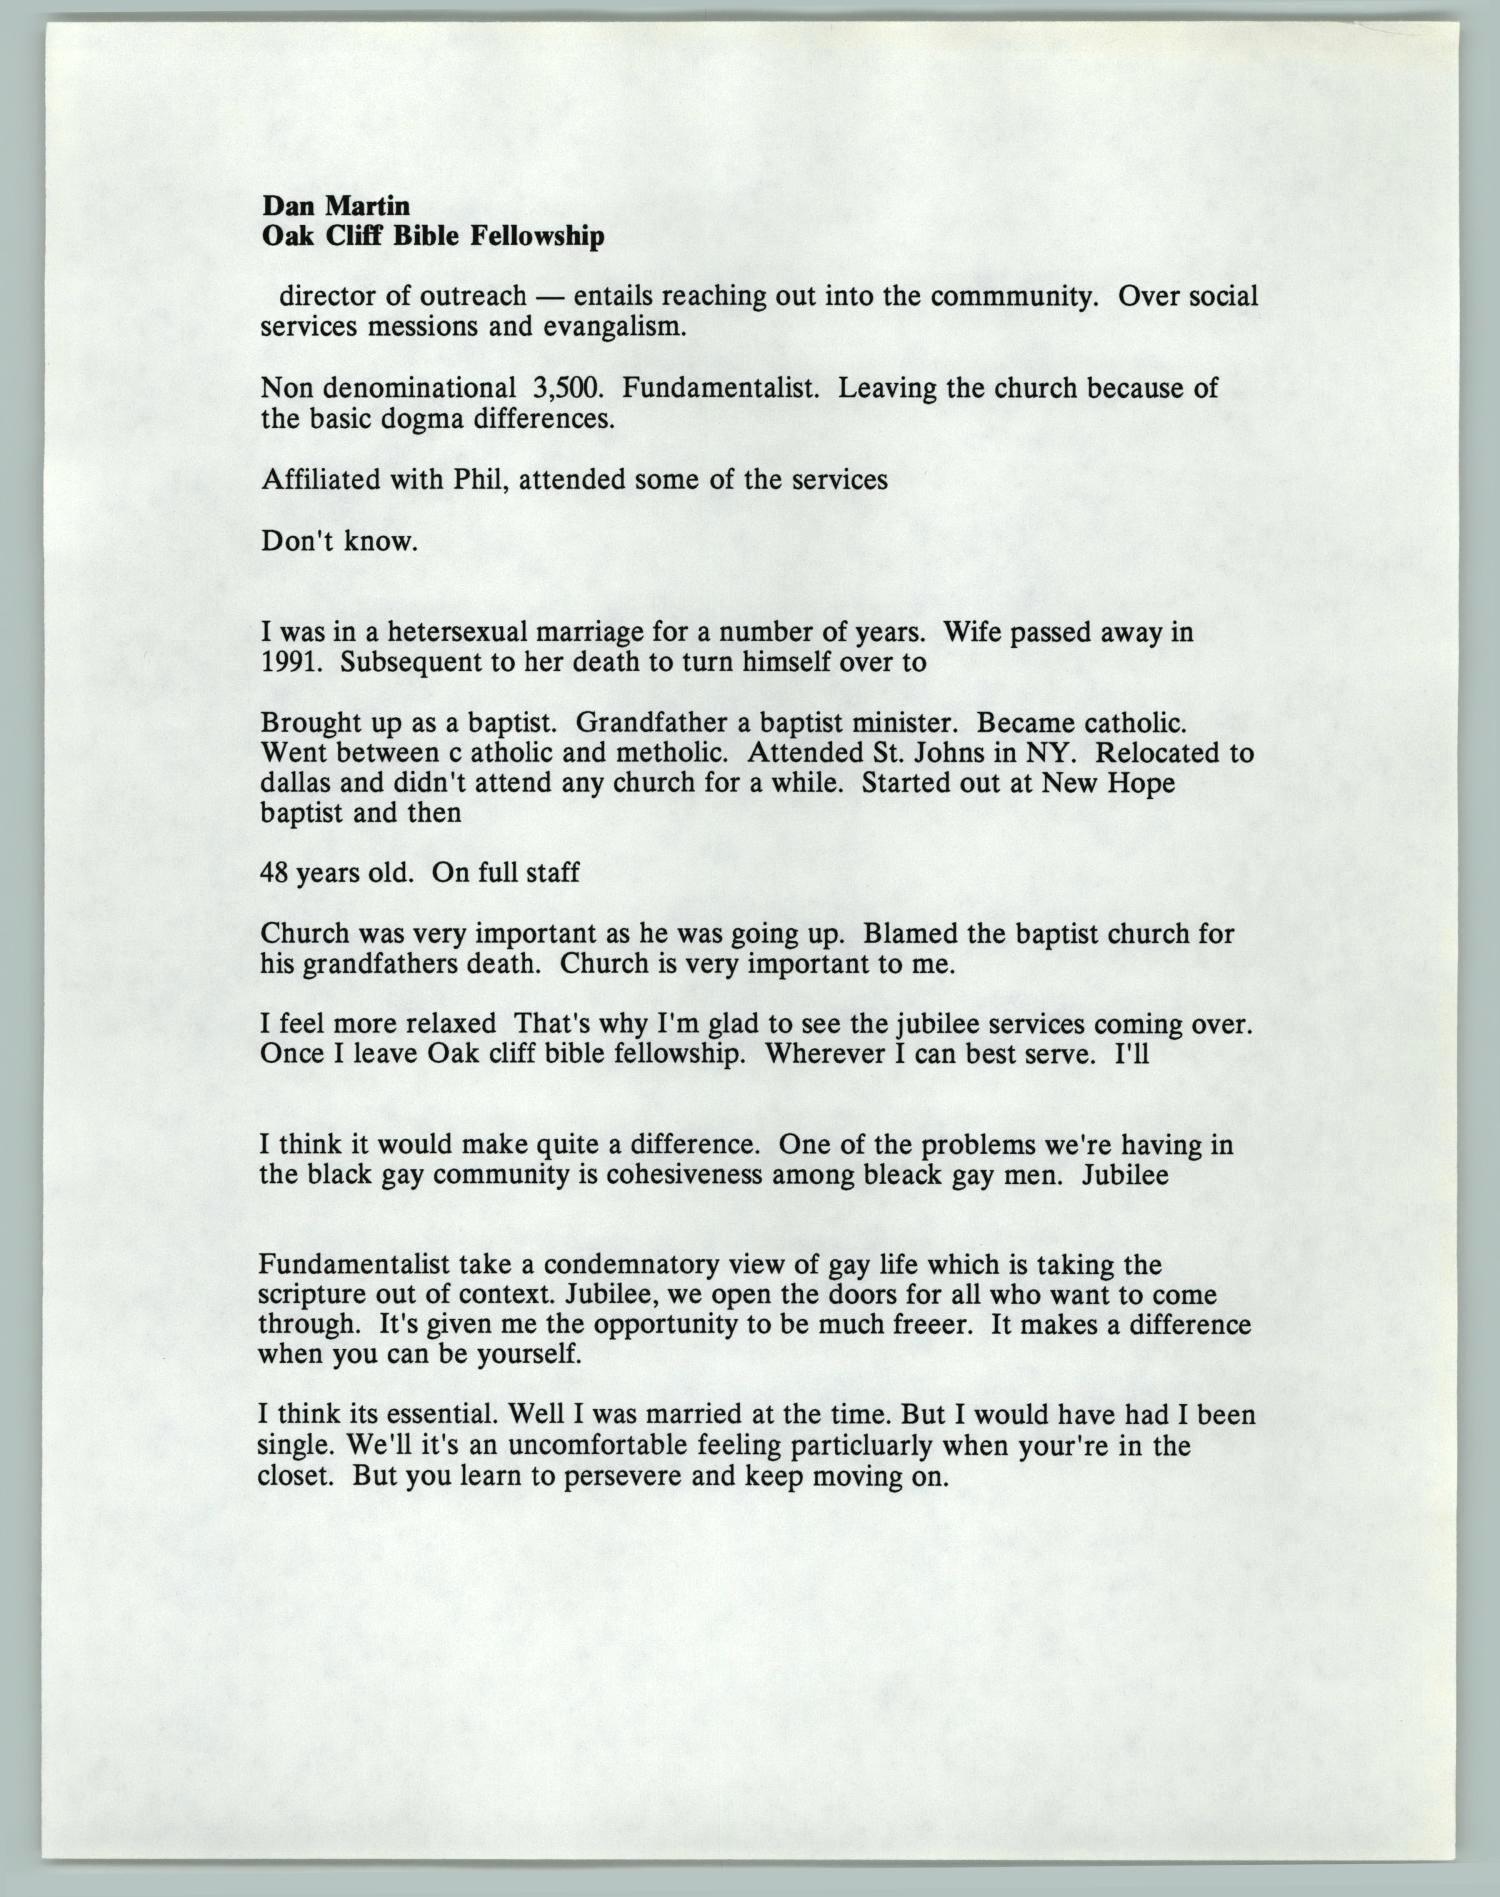 Resolutions for Funerals Examples Fresh [document Dan Martin Oak Cliff Bible Fellowship] the